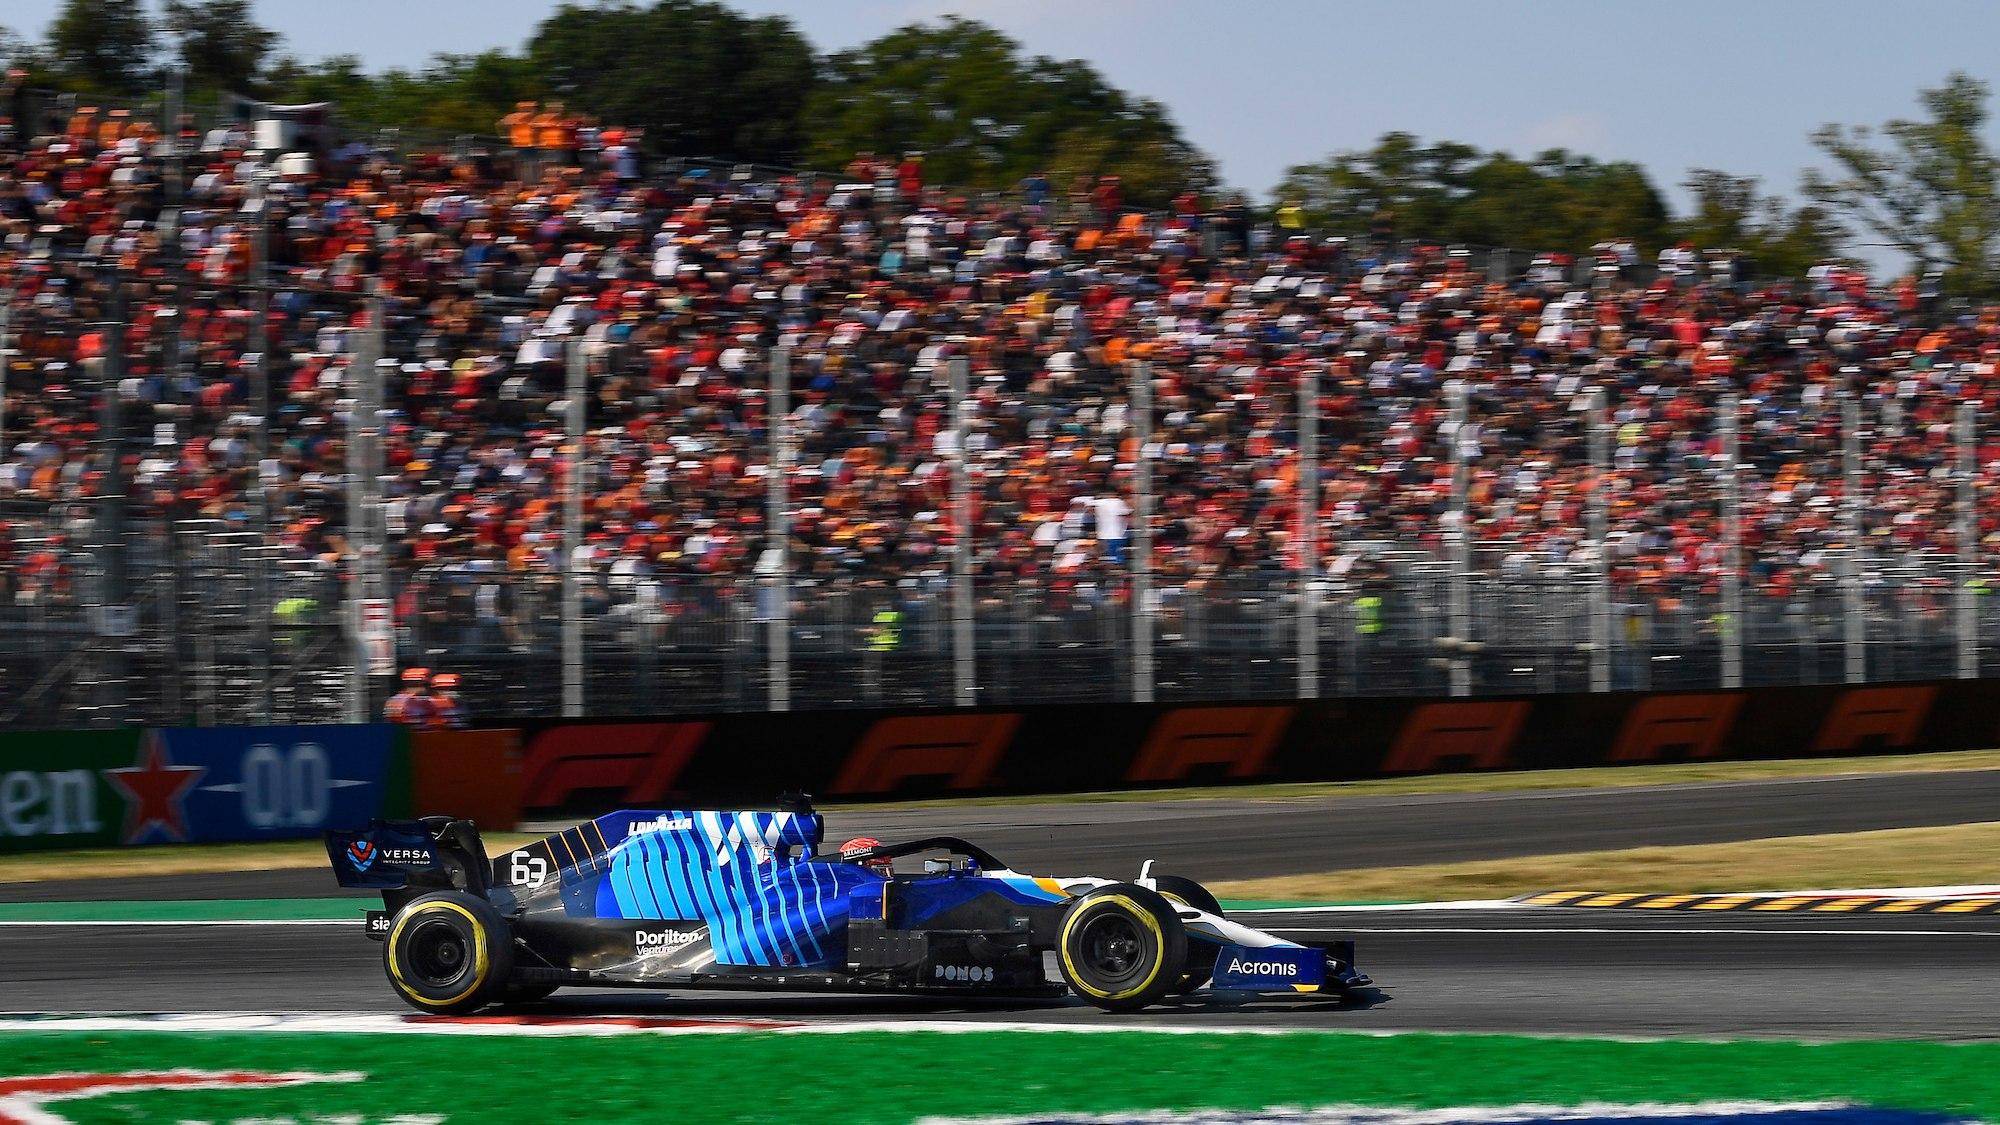 George Russell, 2021 Italian GP